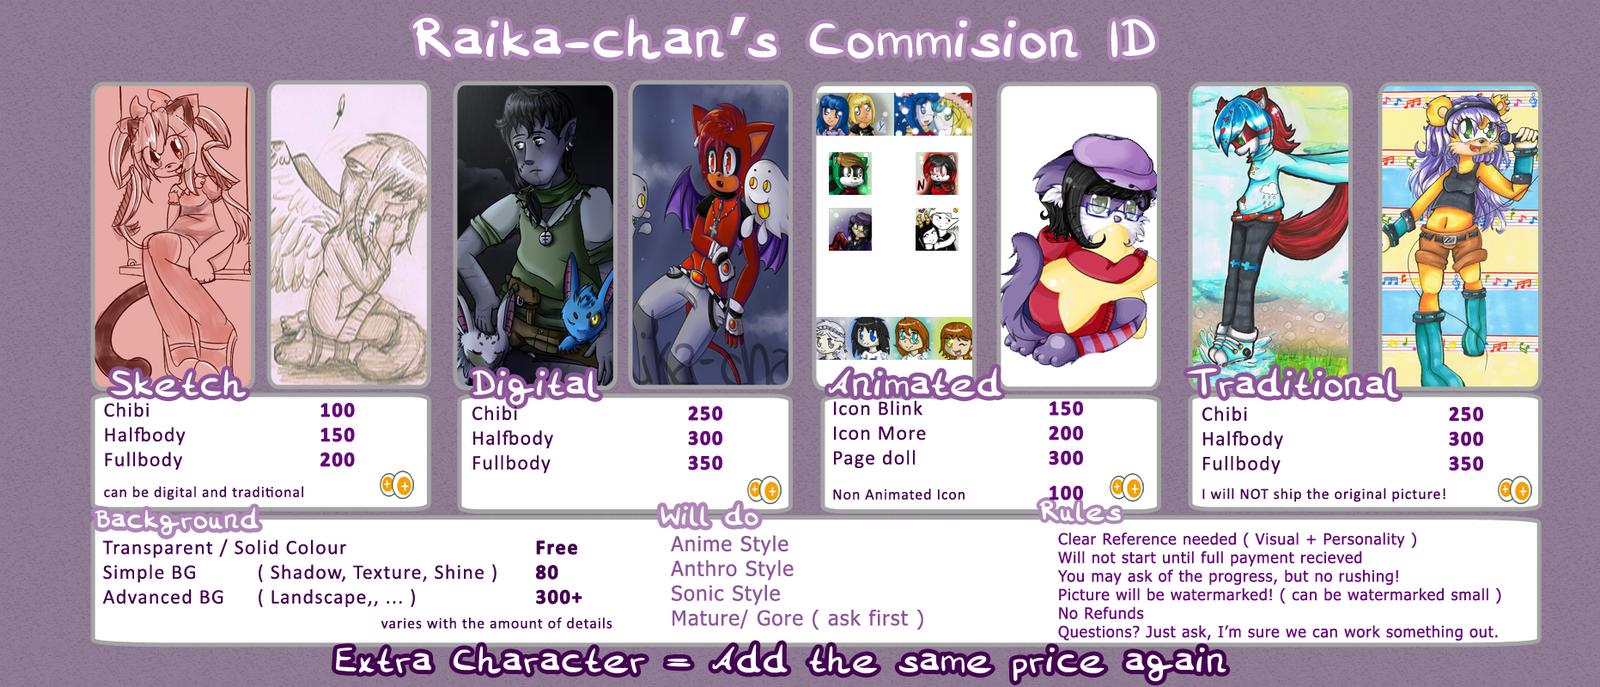 .: Raika-chan's Commission ID 2014 :. by Raika-chan